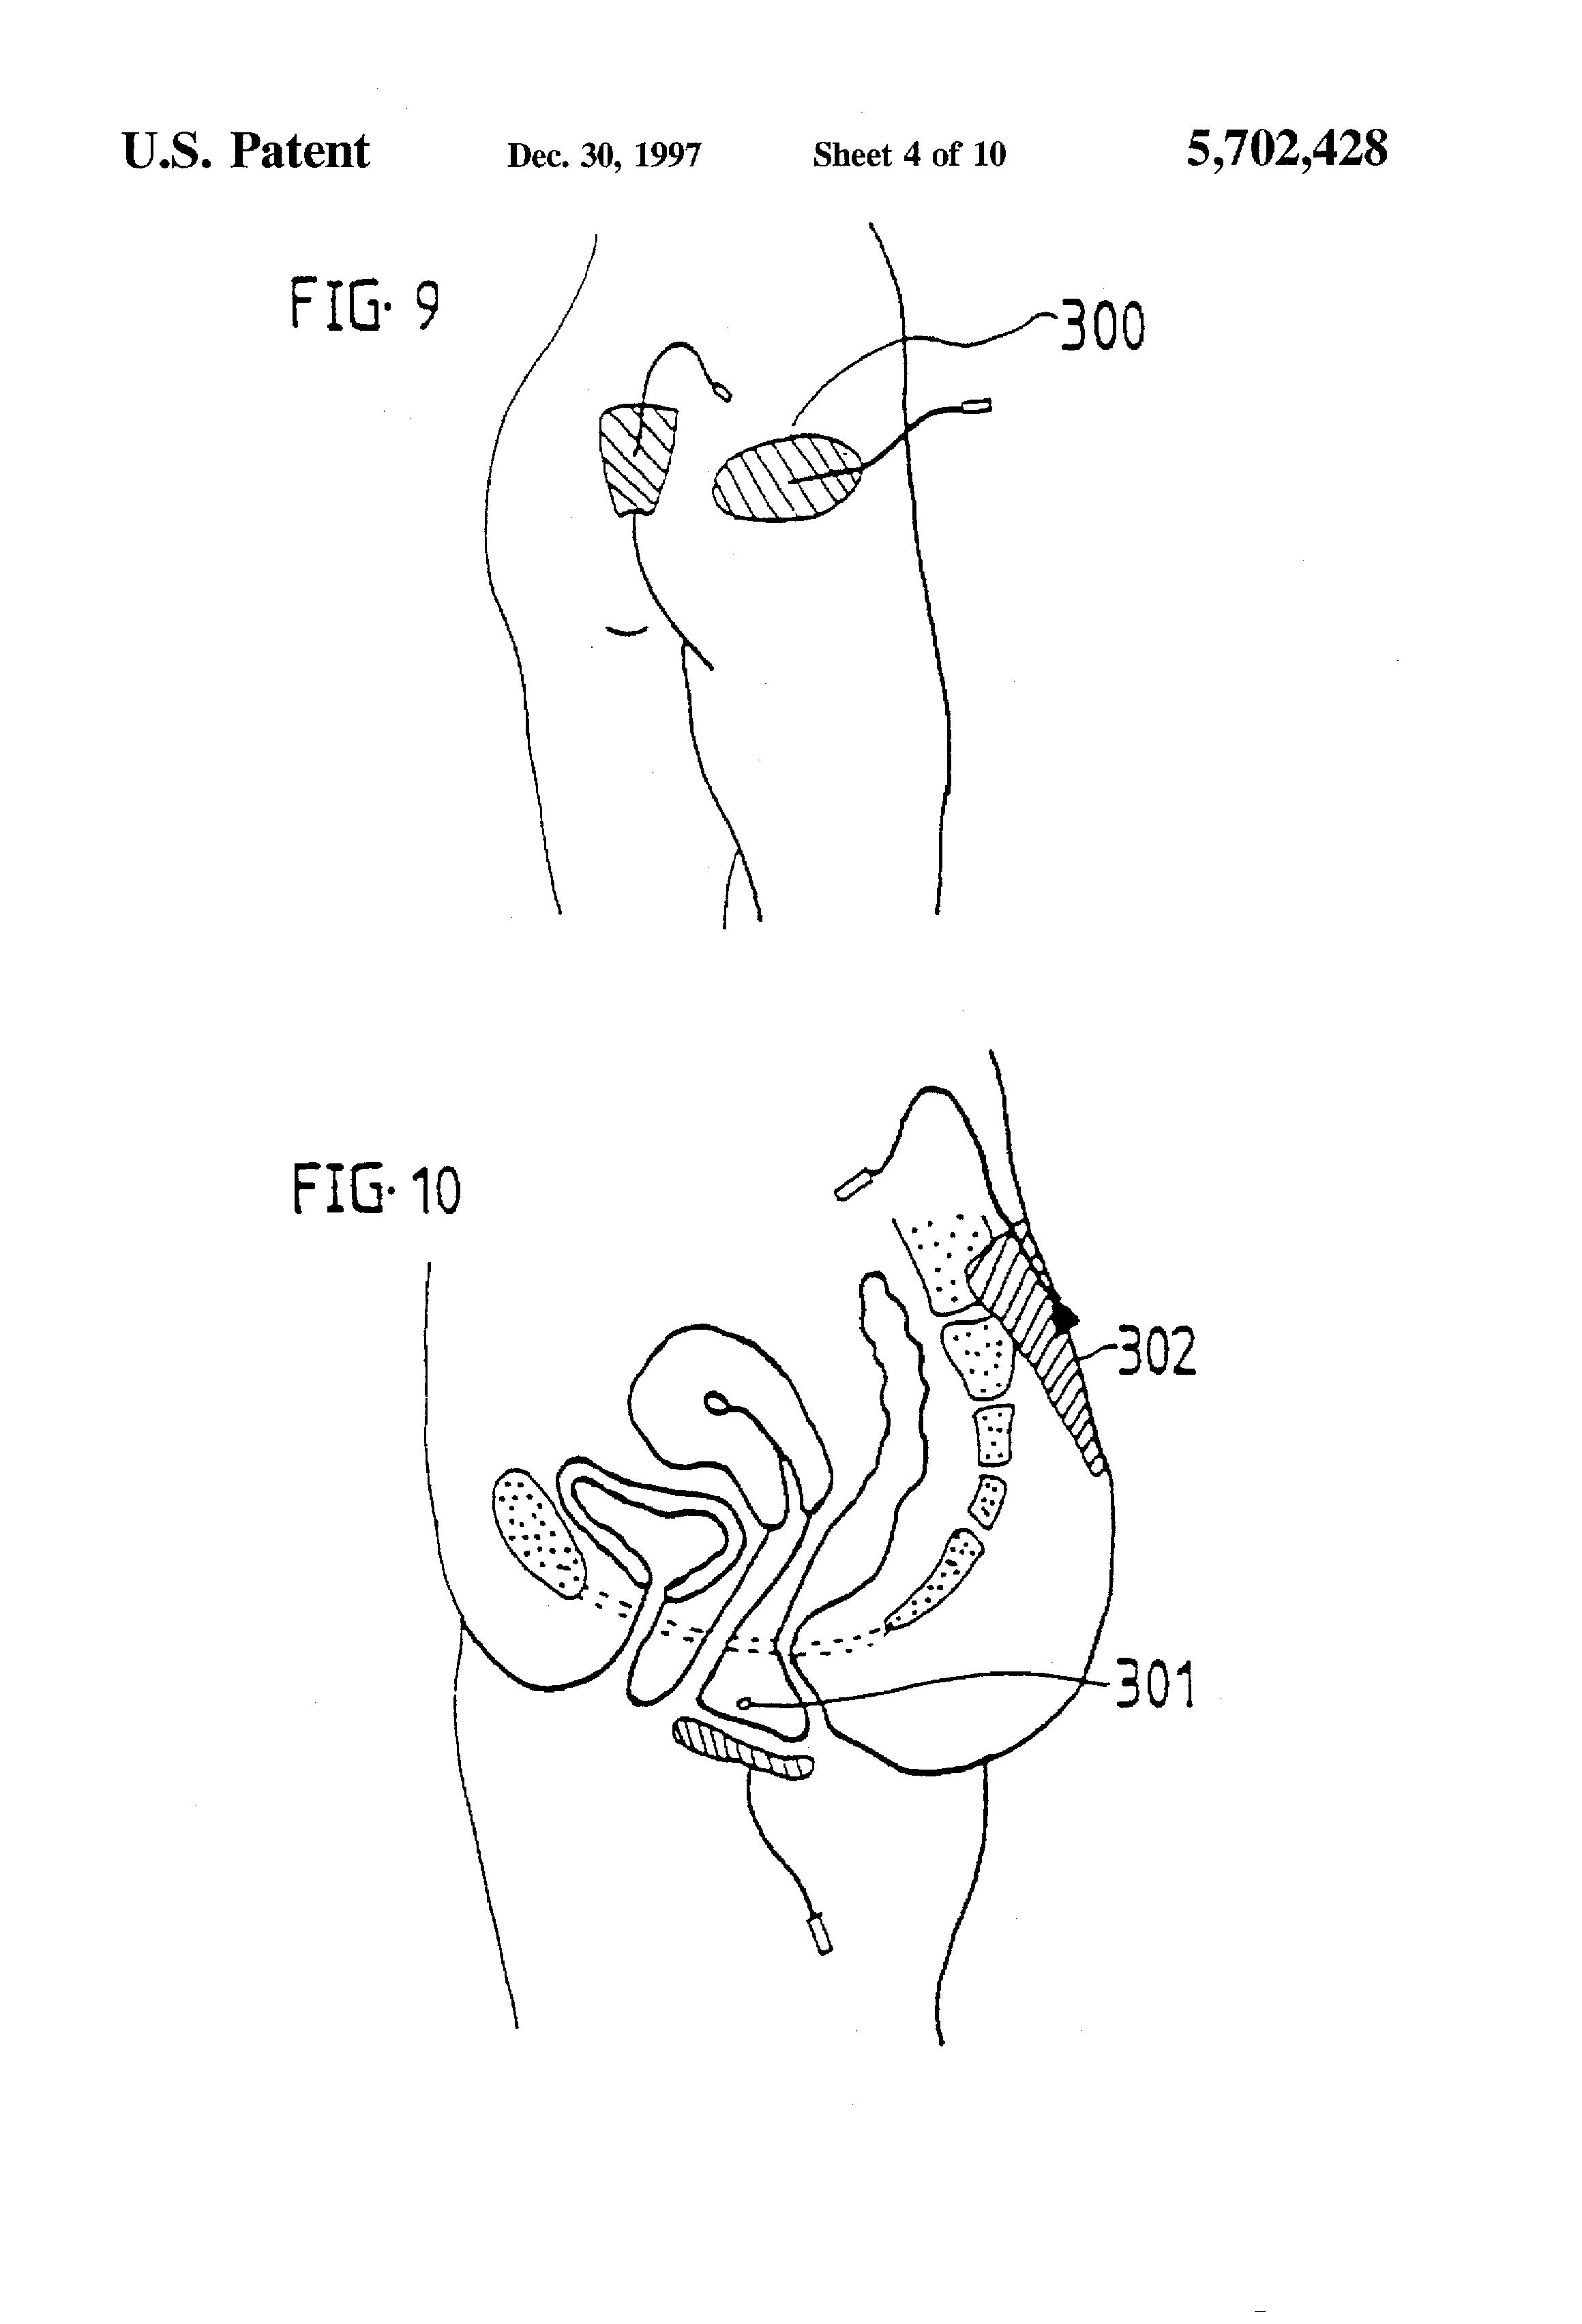 Anal stimulation instructions kind